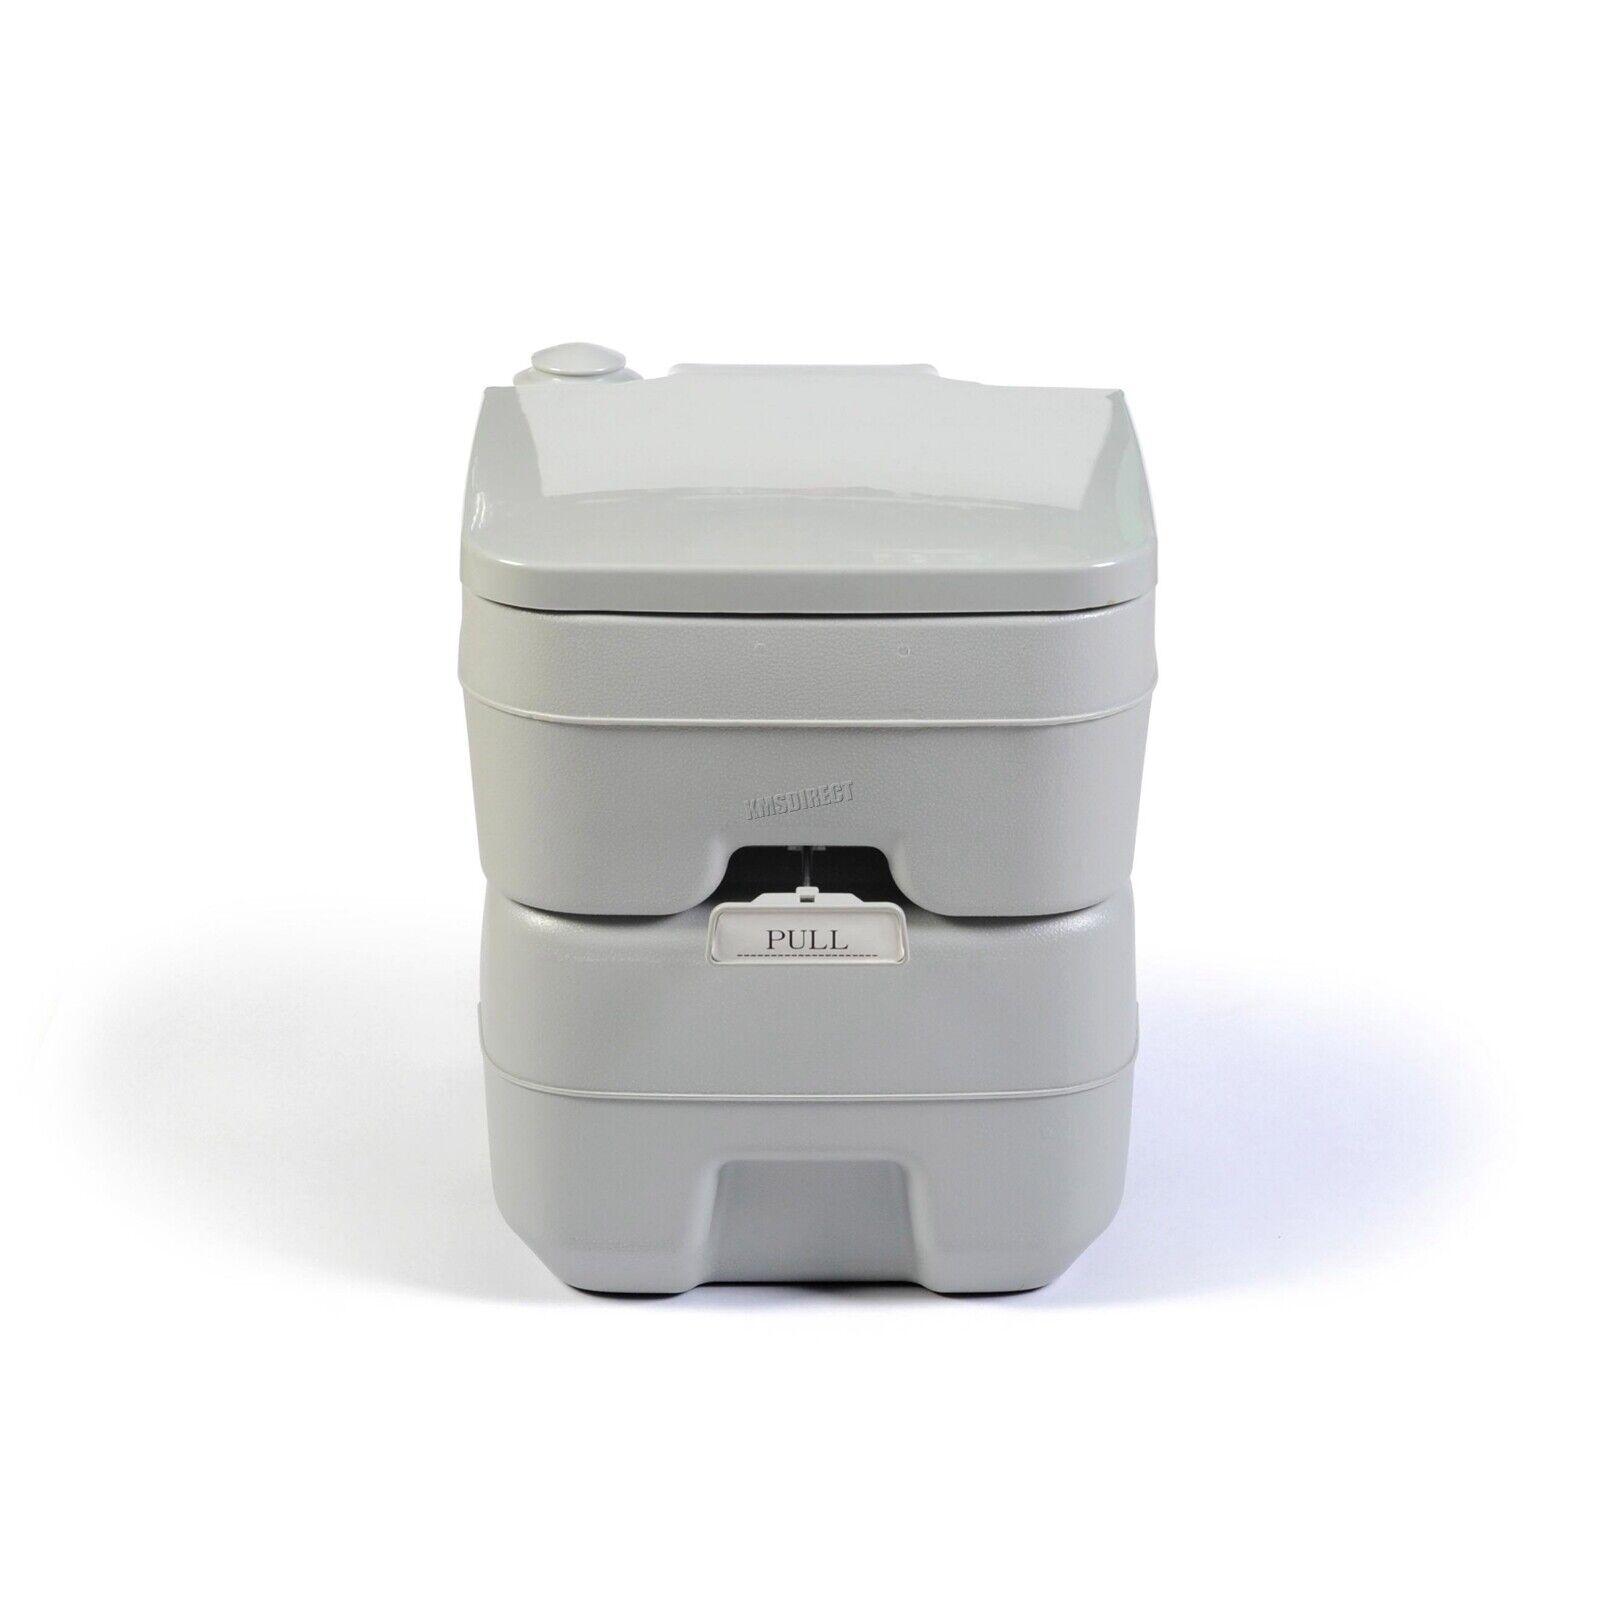 FoxHunter 20L Portable Toilet Flush Caravan Camping Travel WC Loo Porta Potty 2